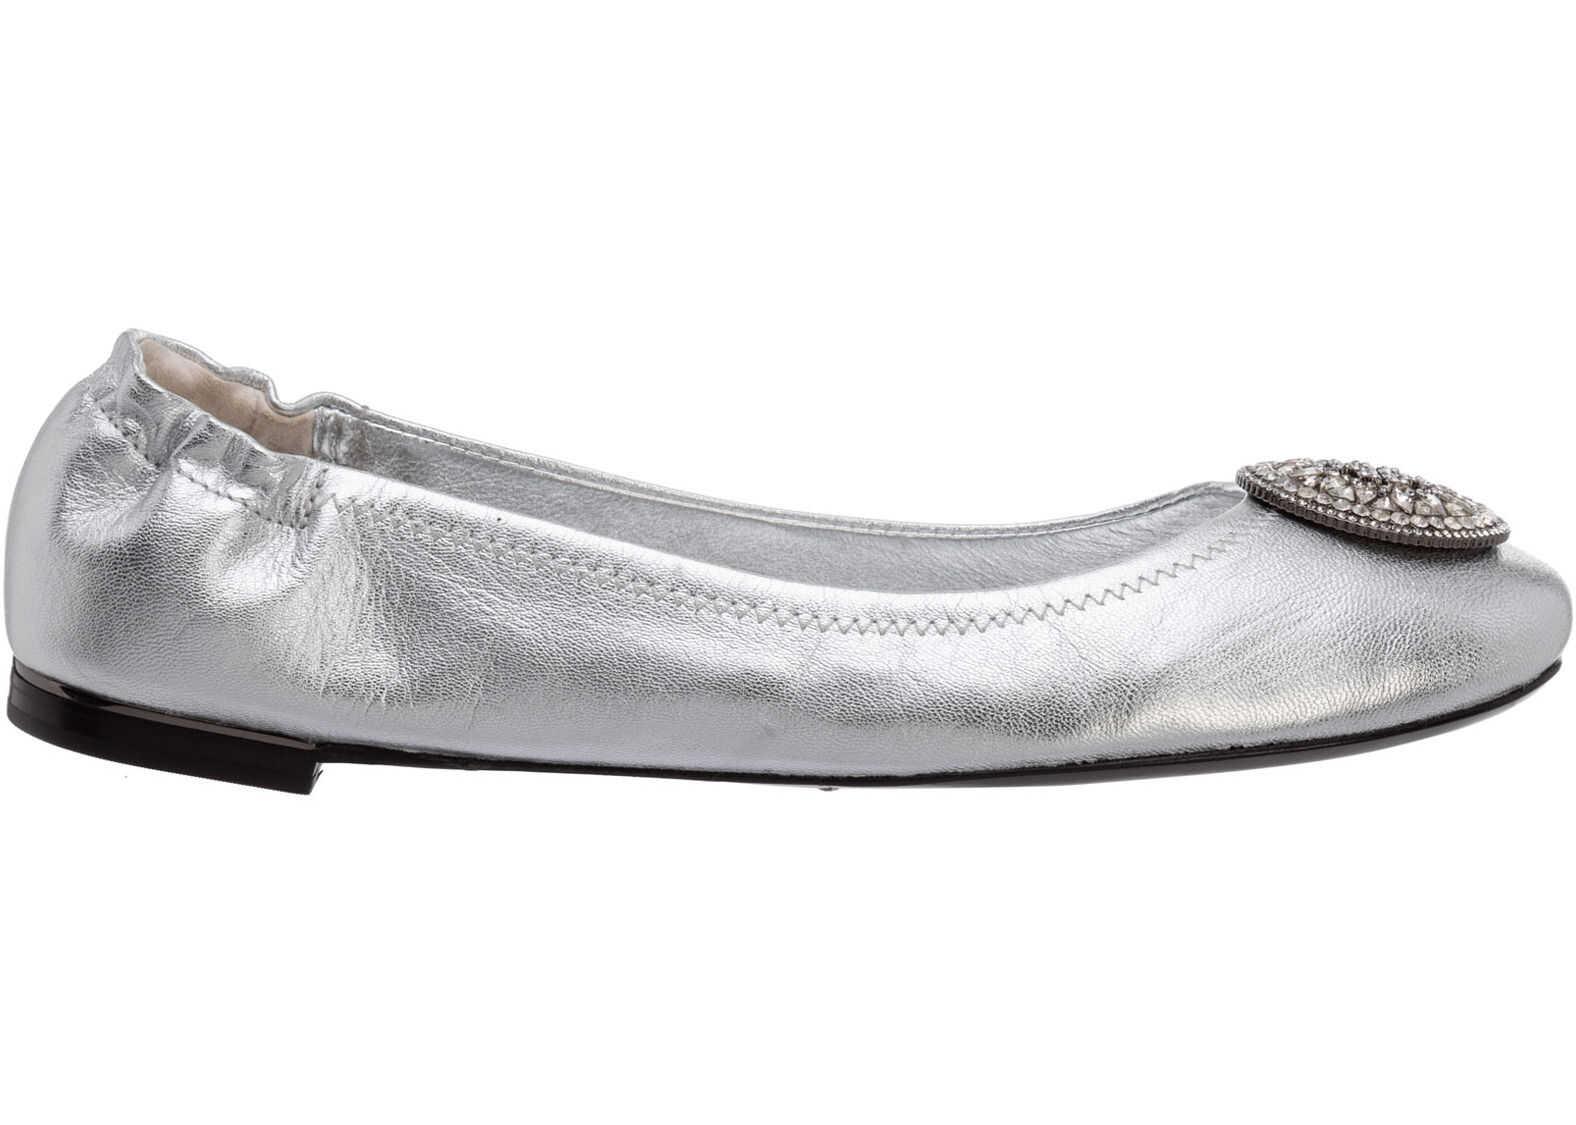 Tory Burch Flats Ballerinas 79198 Silver imagine b-mall.ro